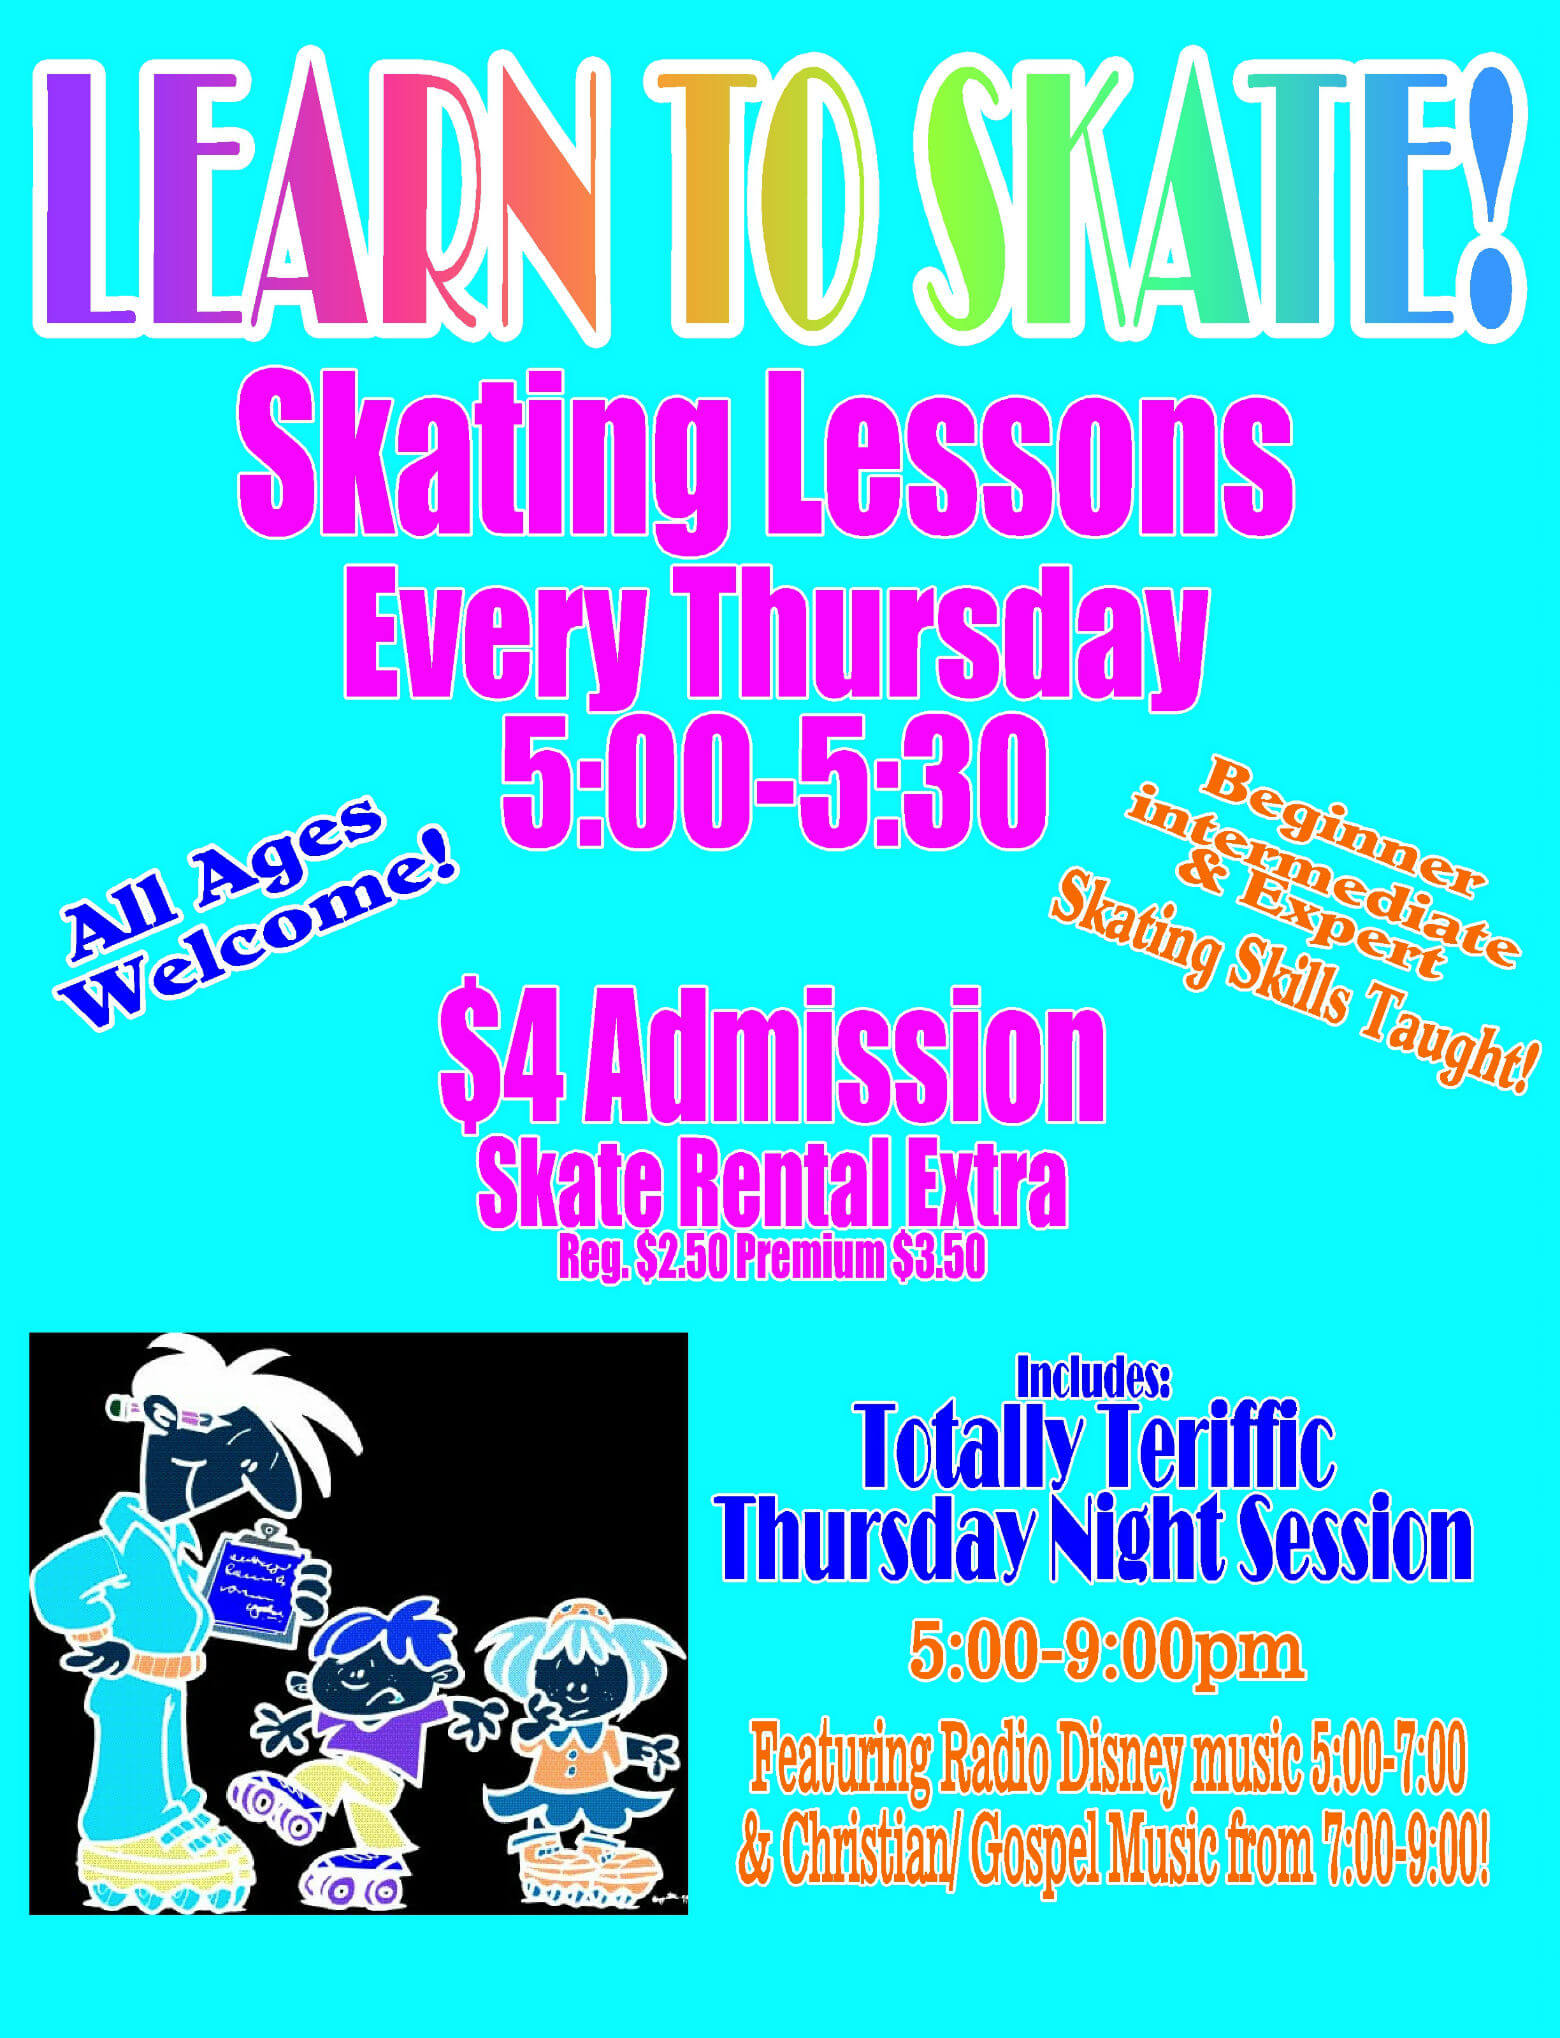 Learn to skate- website